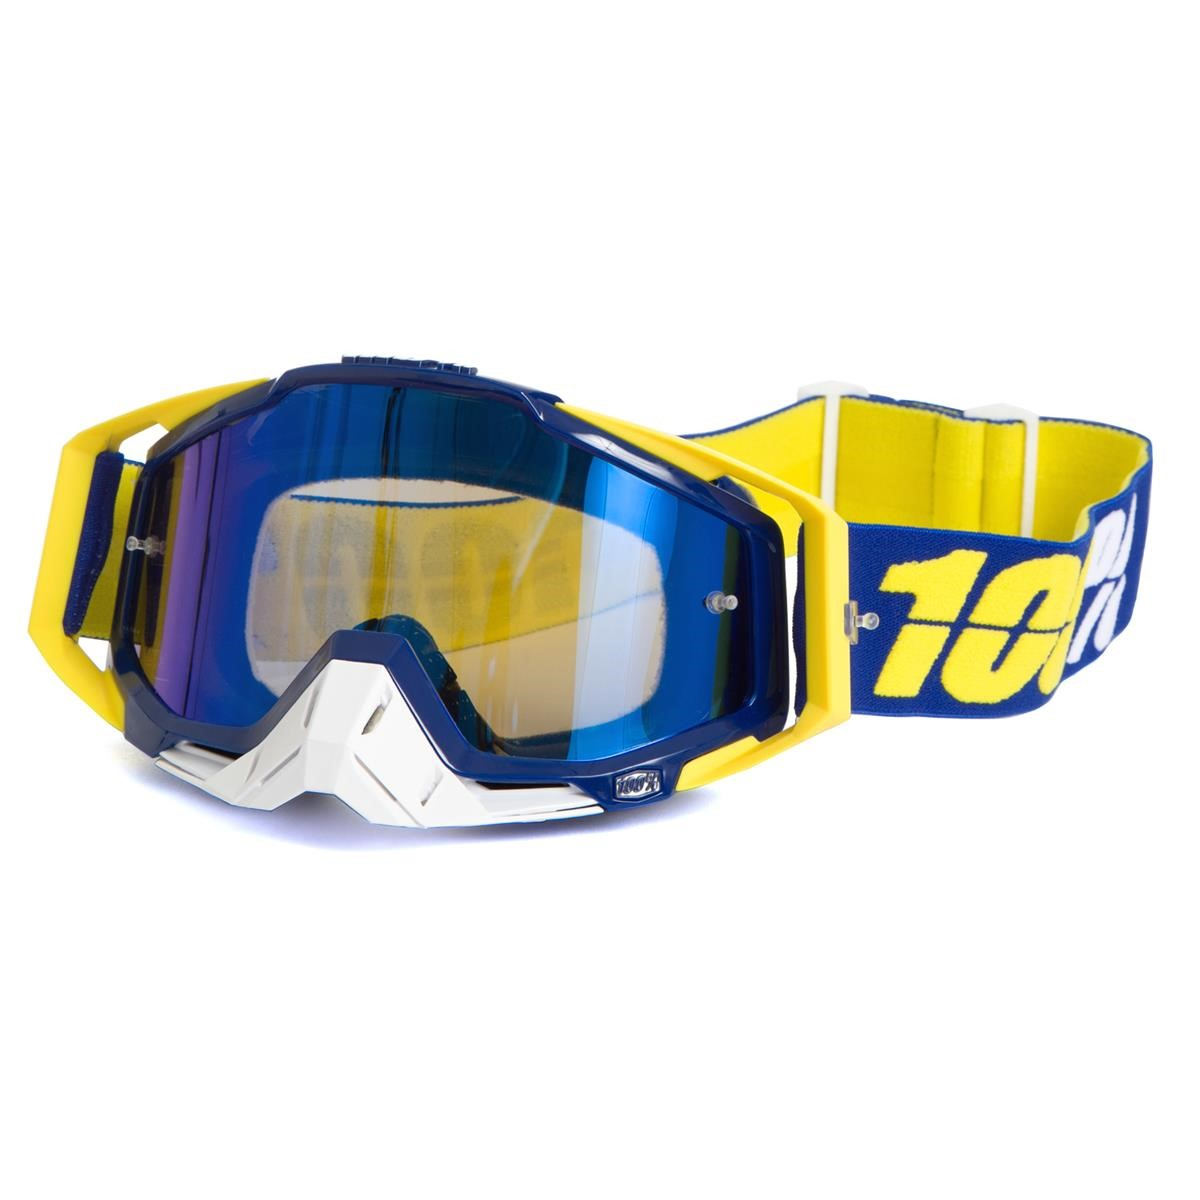 100% Crossbrille The Racecraft Lindstrom - Blau verspiegelt Anti-Fog